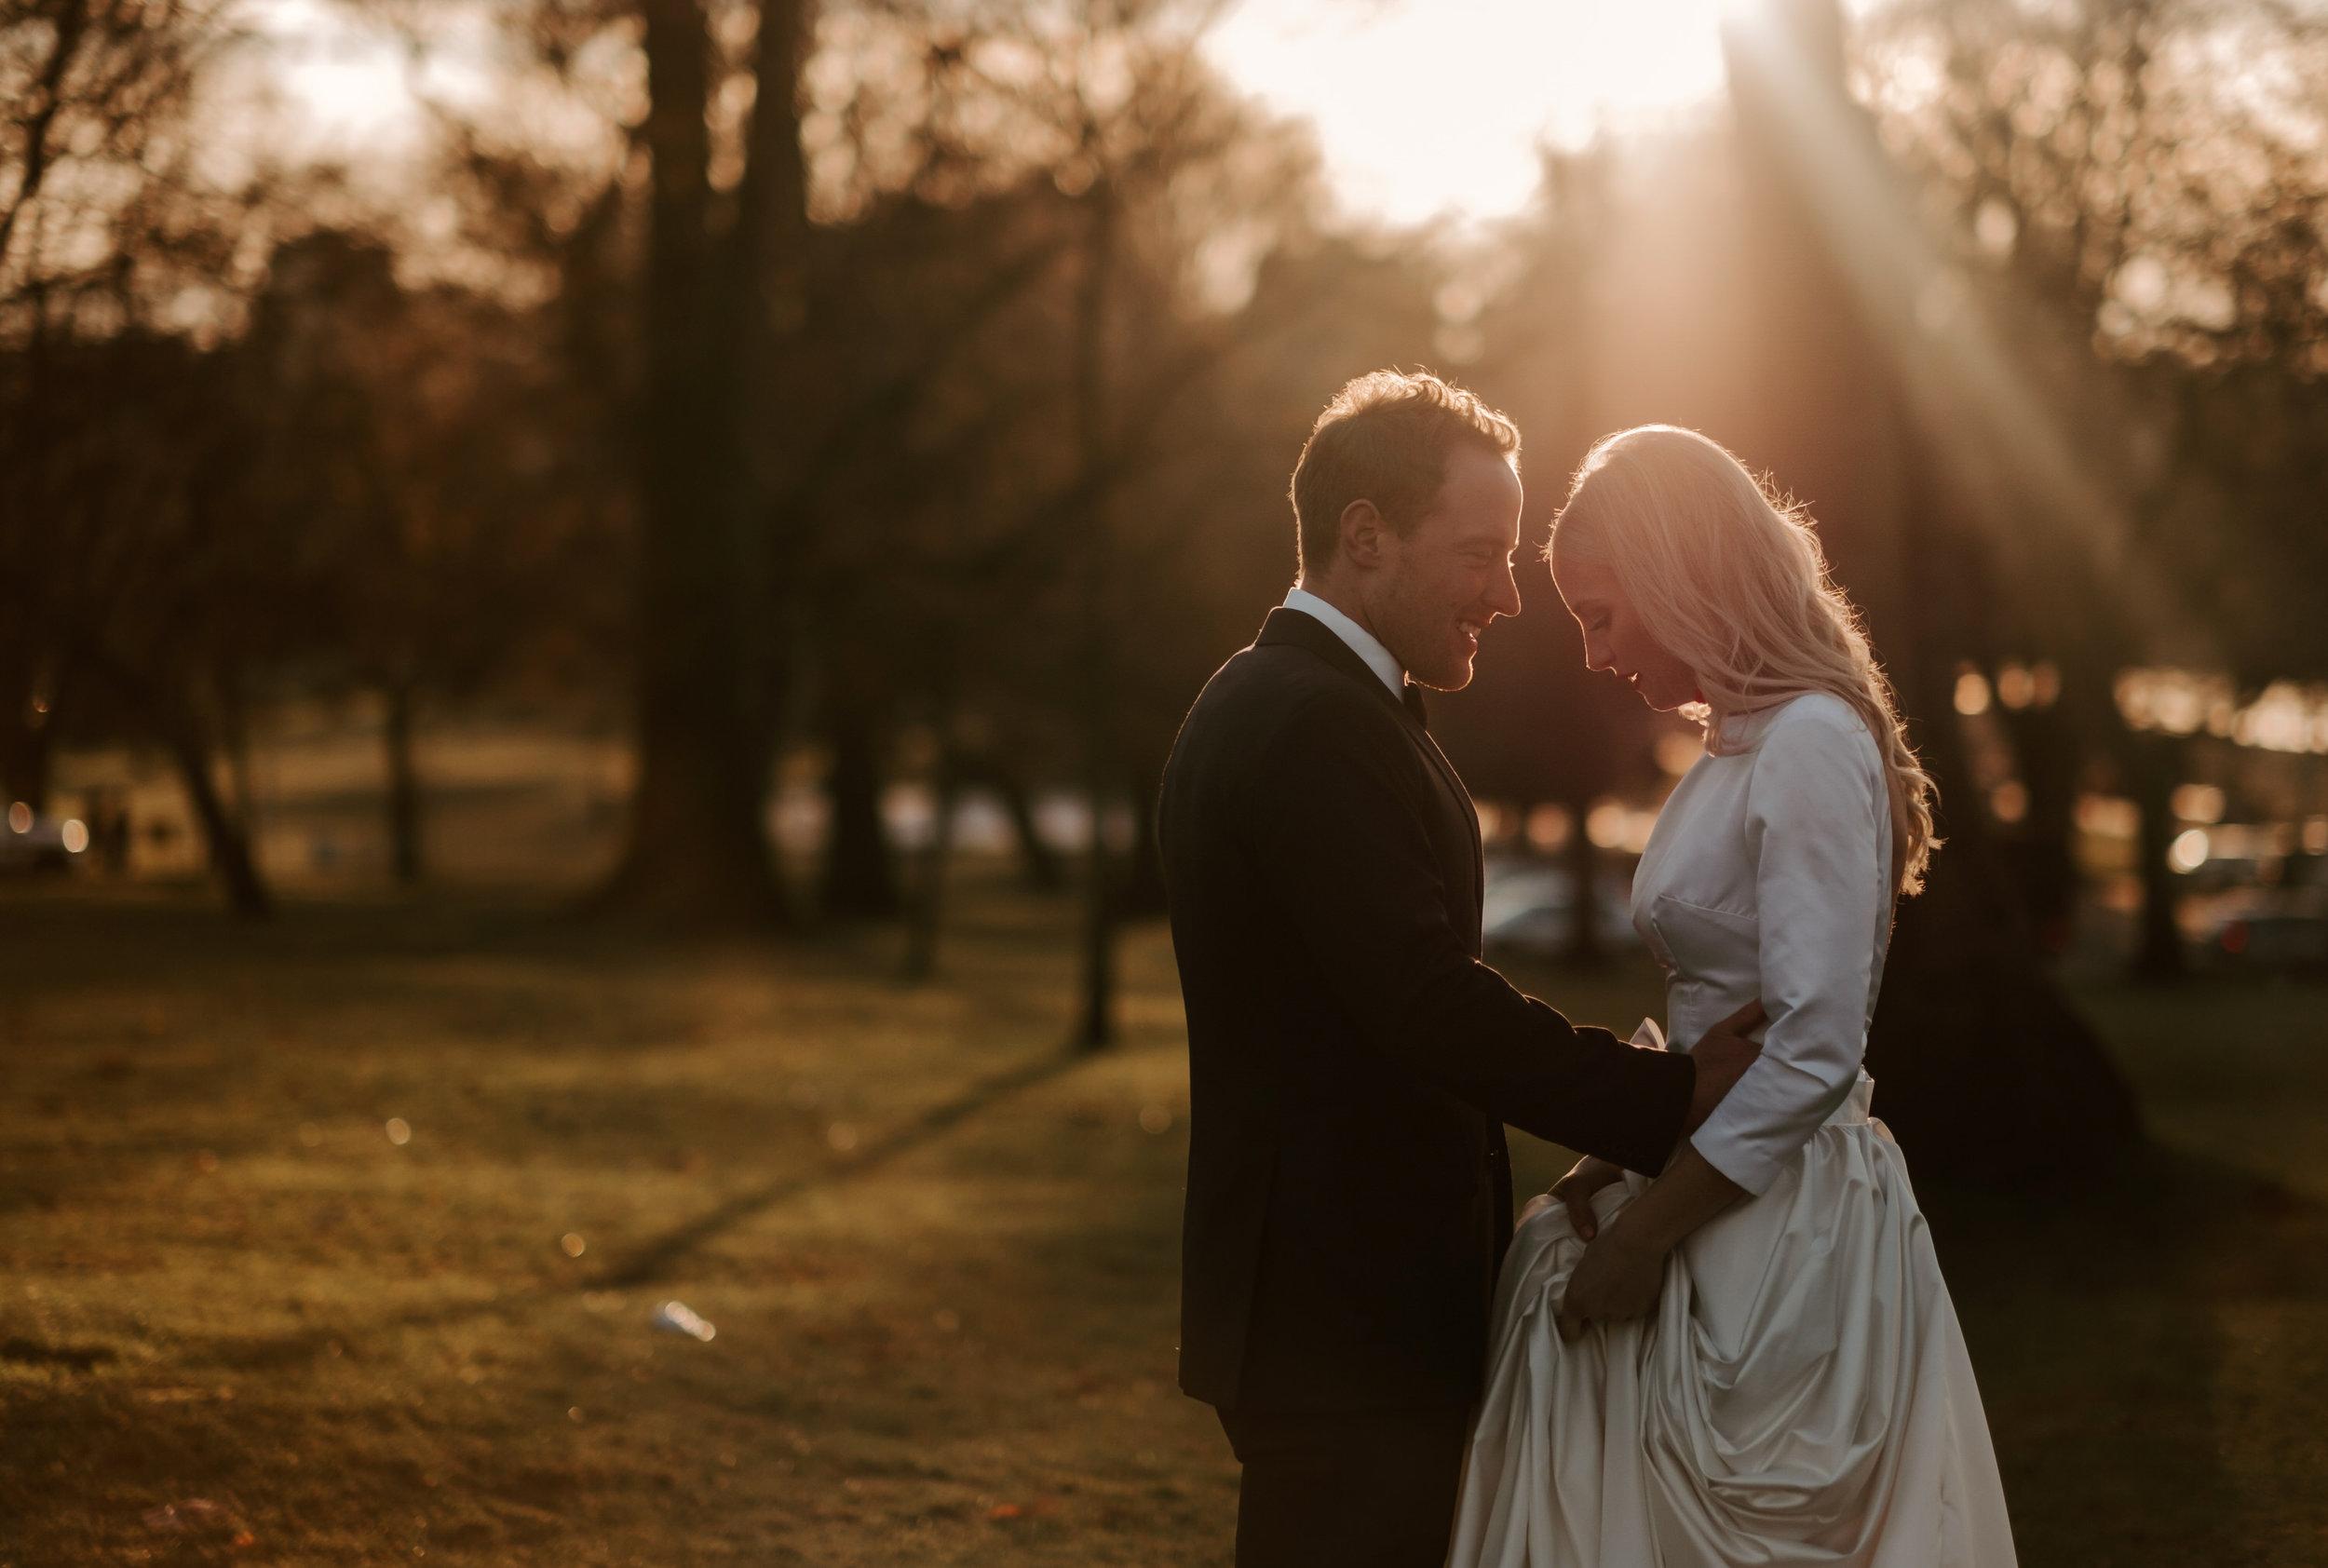 Vancouver Wedding Photos - Vegan Wedding Photographer - New Years Eve Wedding Photos - Vancouver Wedding Photographer - Vancouver Wedding Videographer - 770.JPG